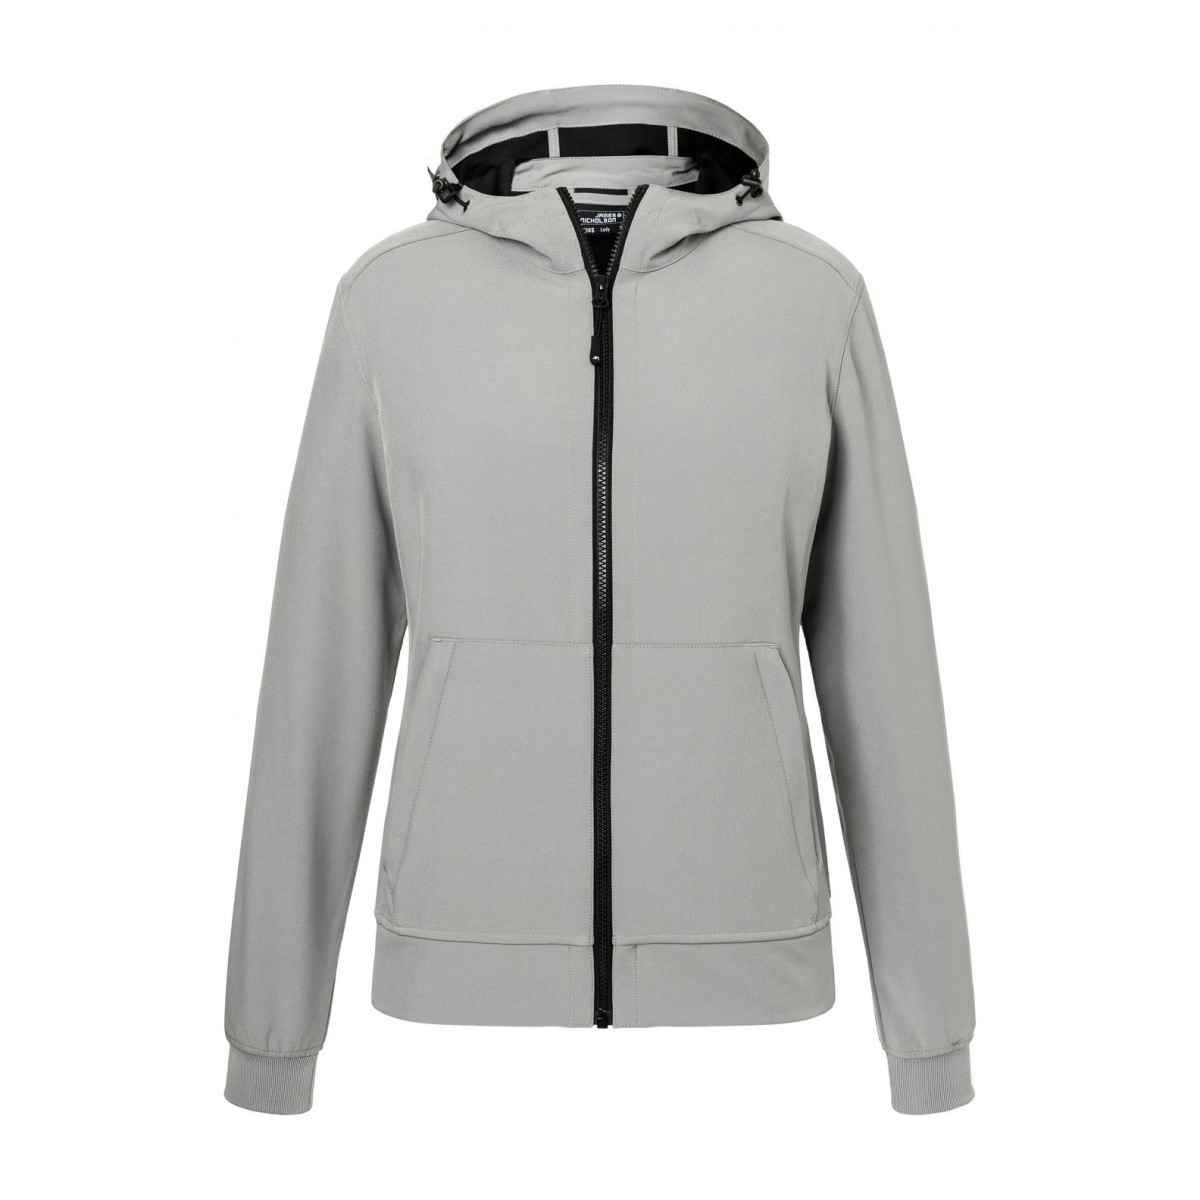 Куртка женская JN1145 Ladies Hooded Softshell Jacket - Светло-серый/Черный